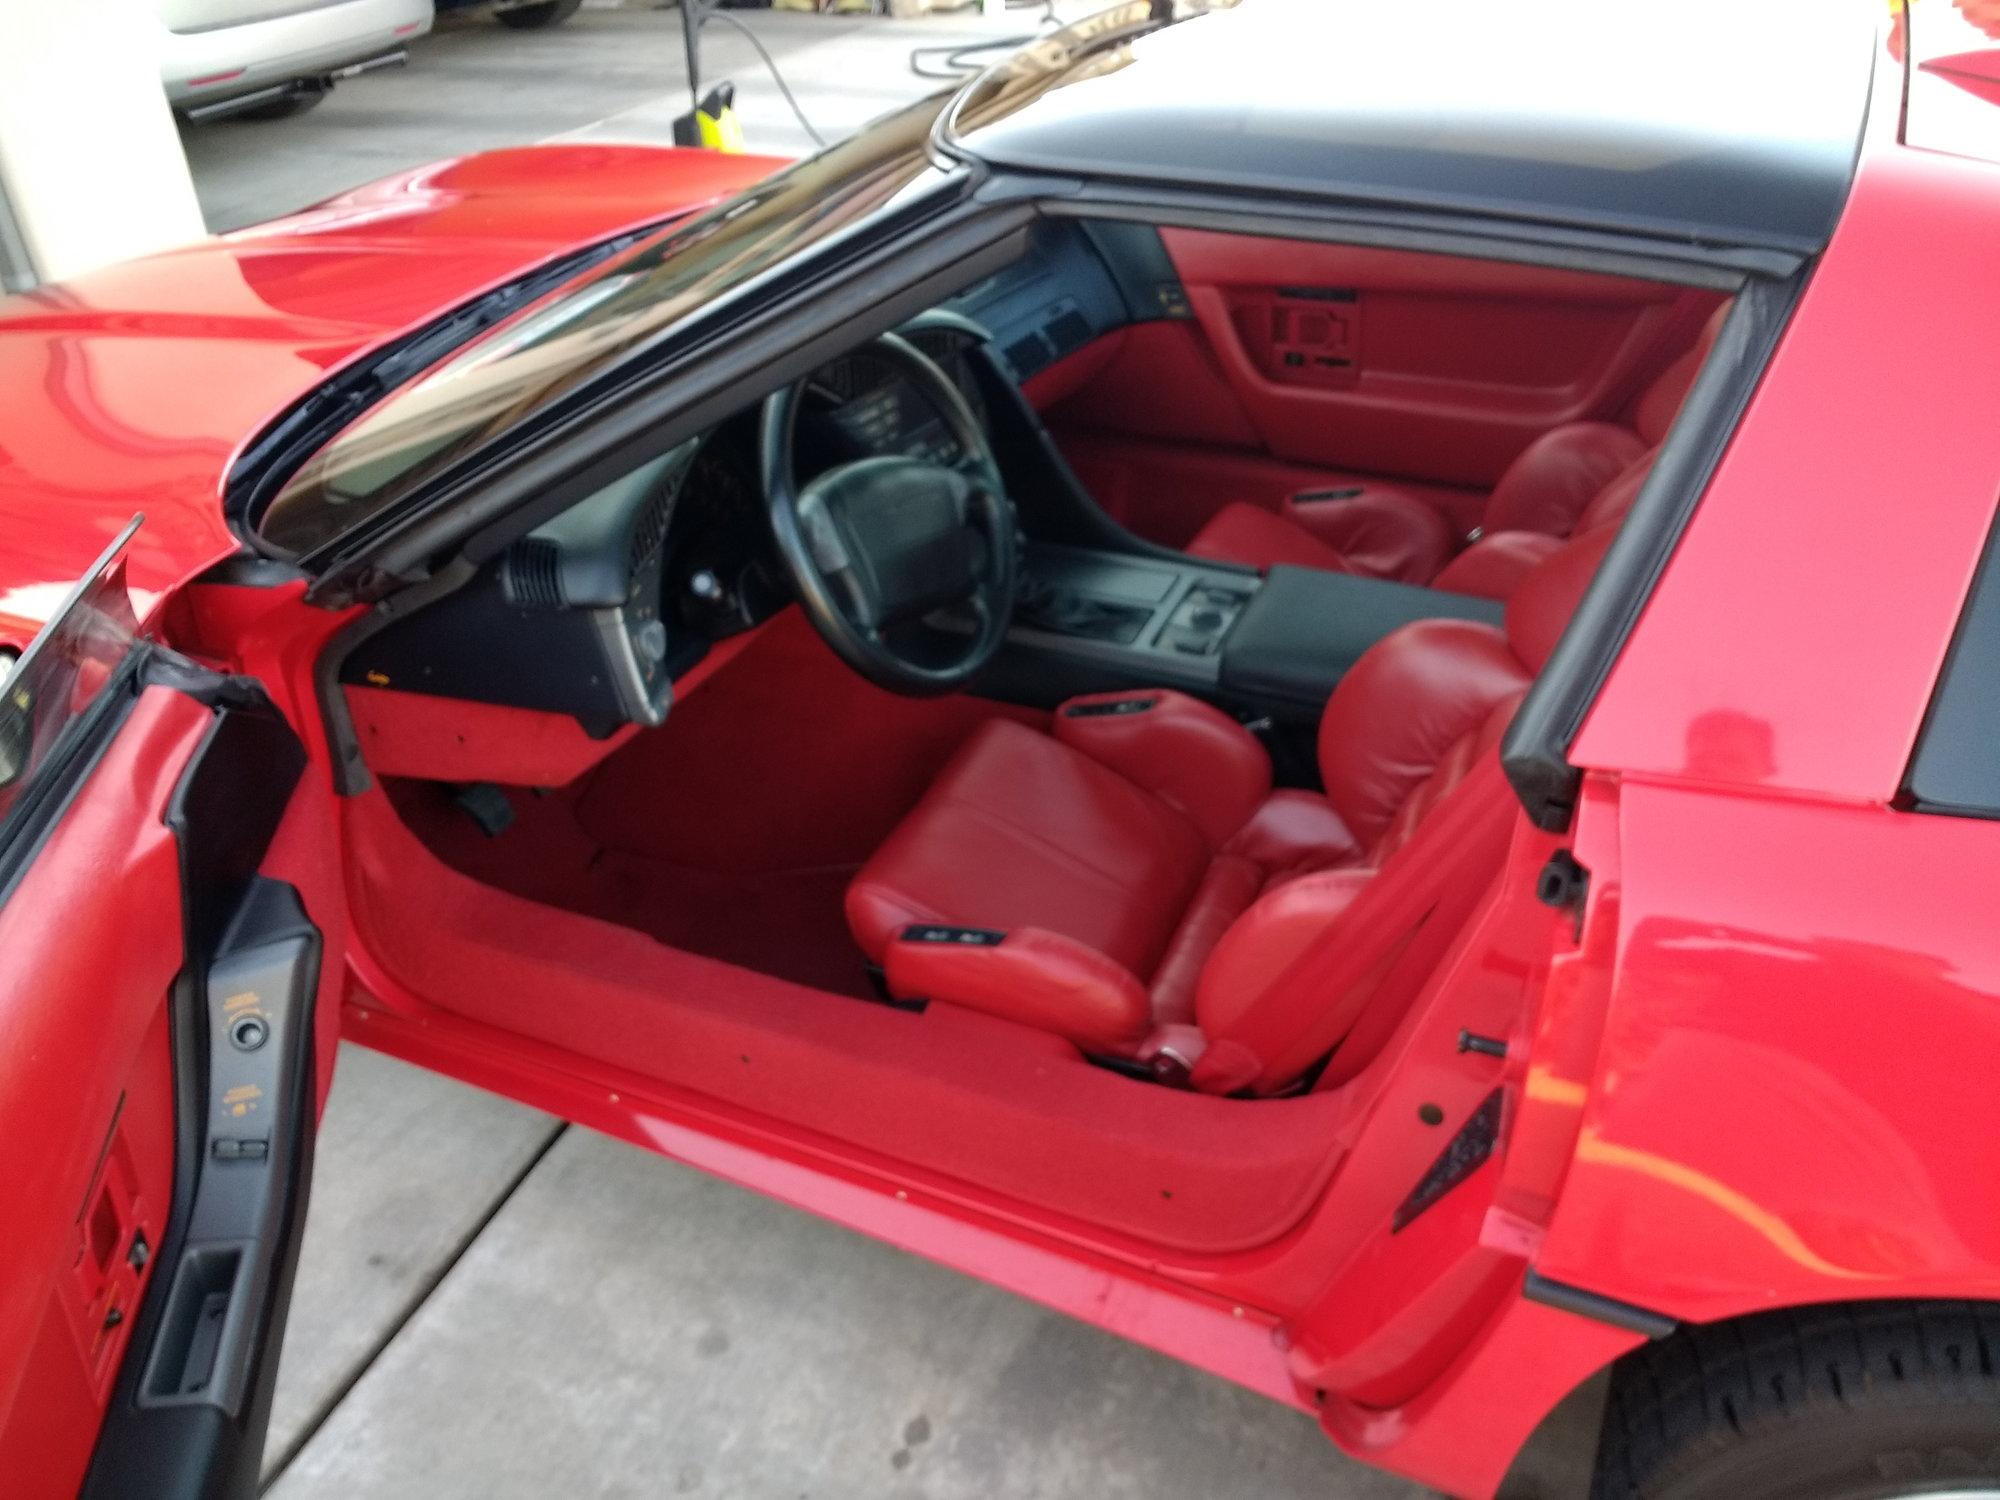 1990 ZR1: Park It Or Drive It?